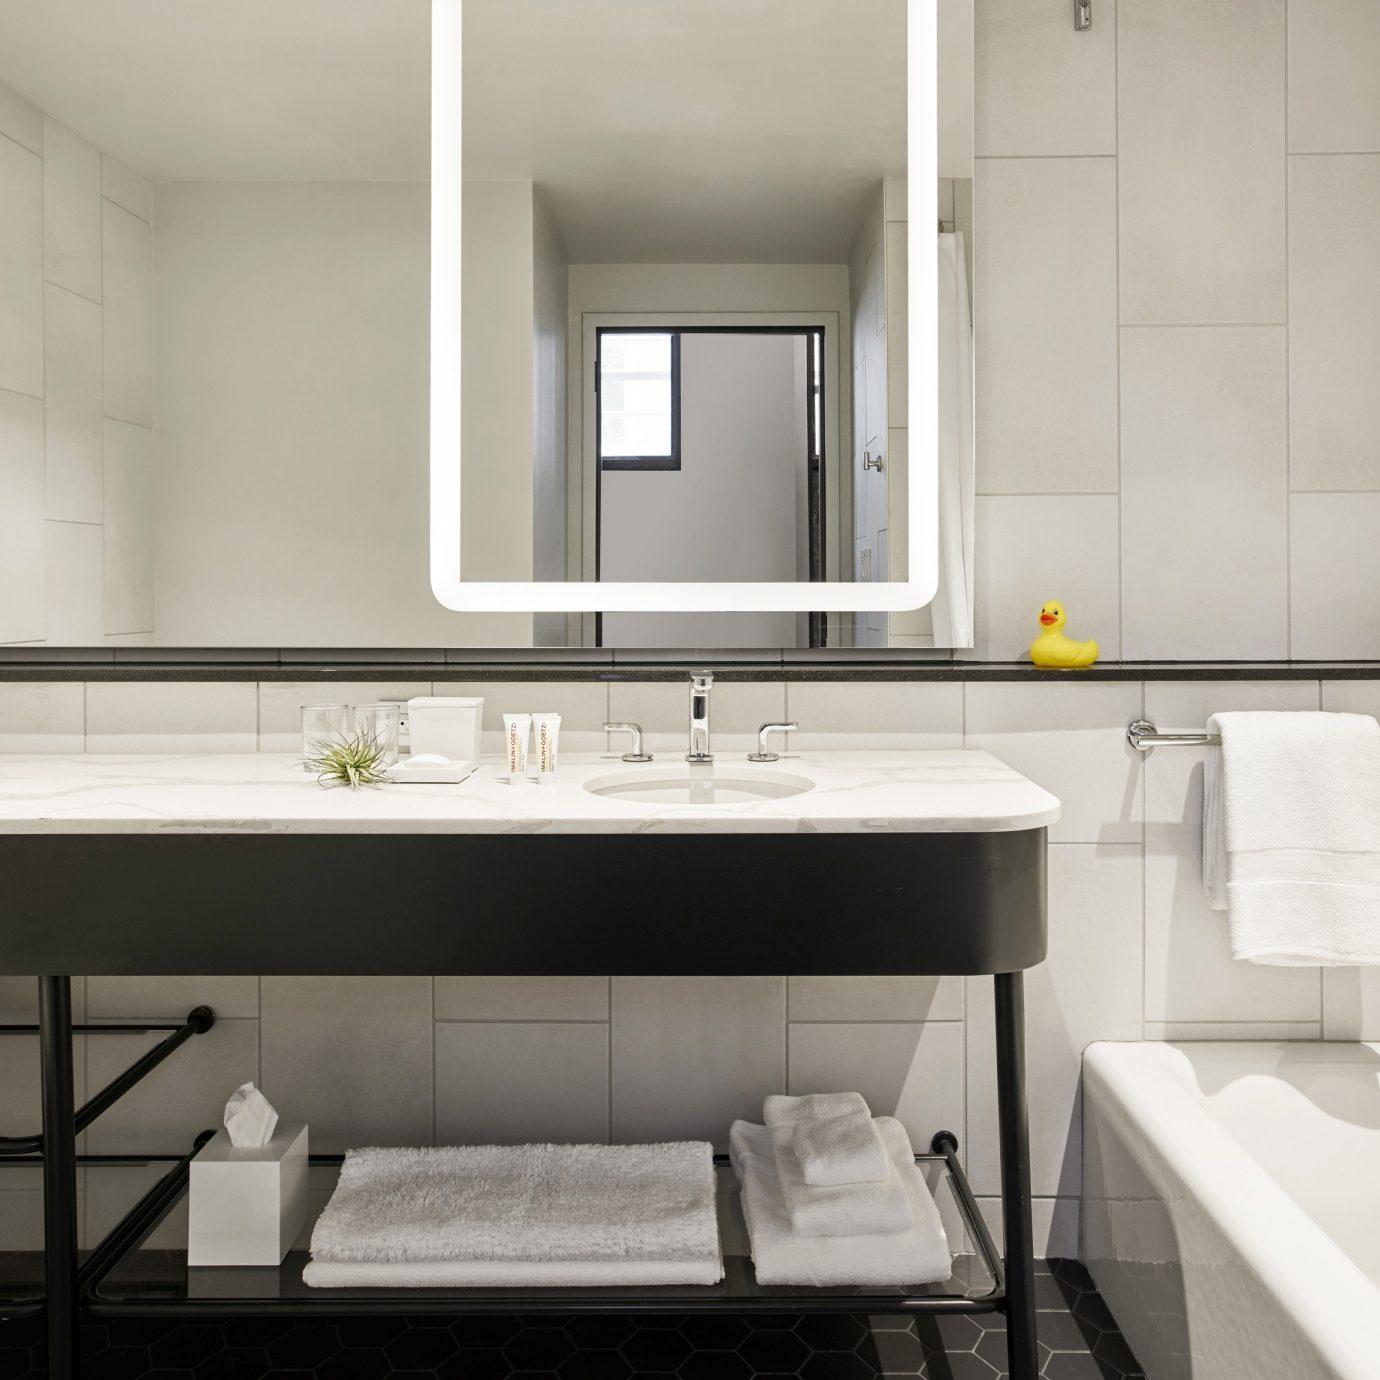 bathroom white property home sink flooring Kitchen tile bathtub tiled